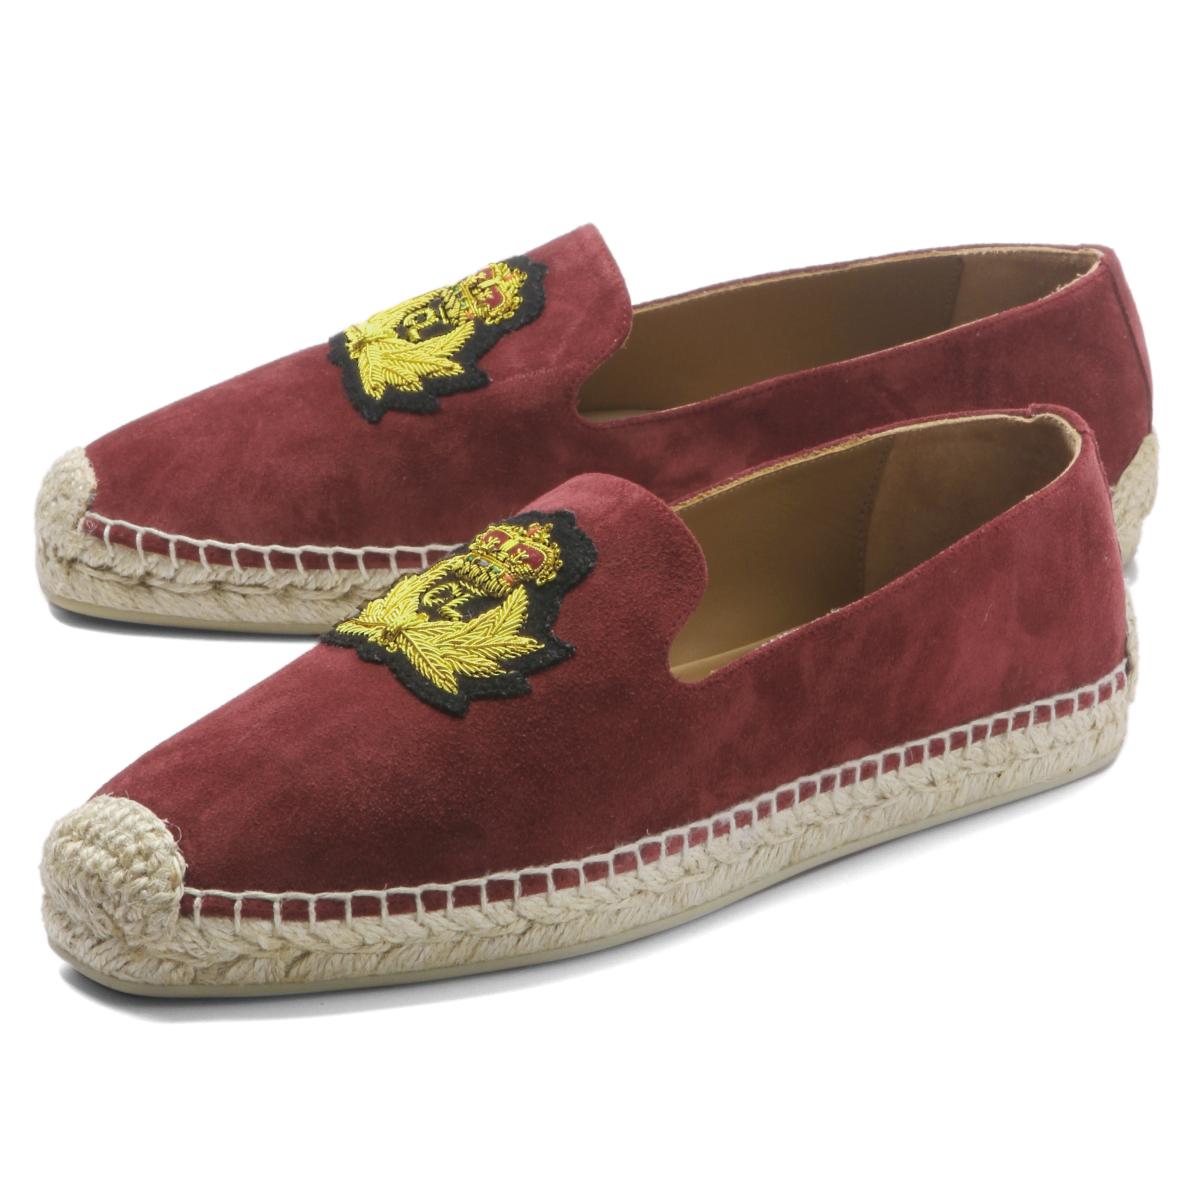 moins cher da7cf 23c19 germany christian louboutin shoes flats espadrilles 98811 c84a1